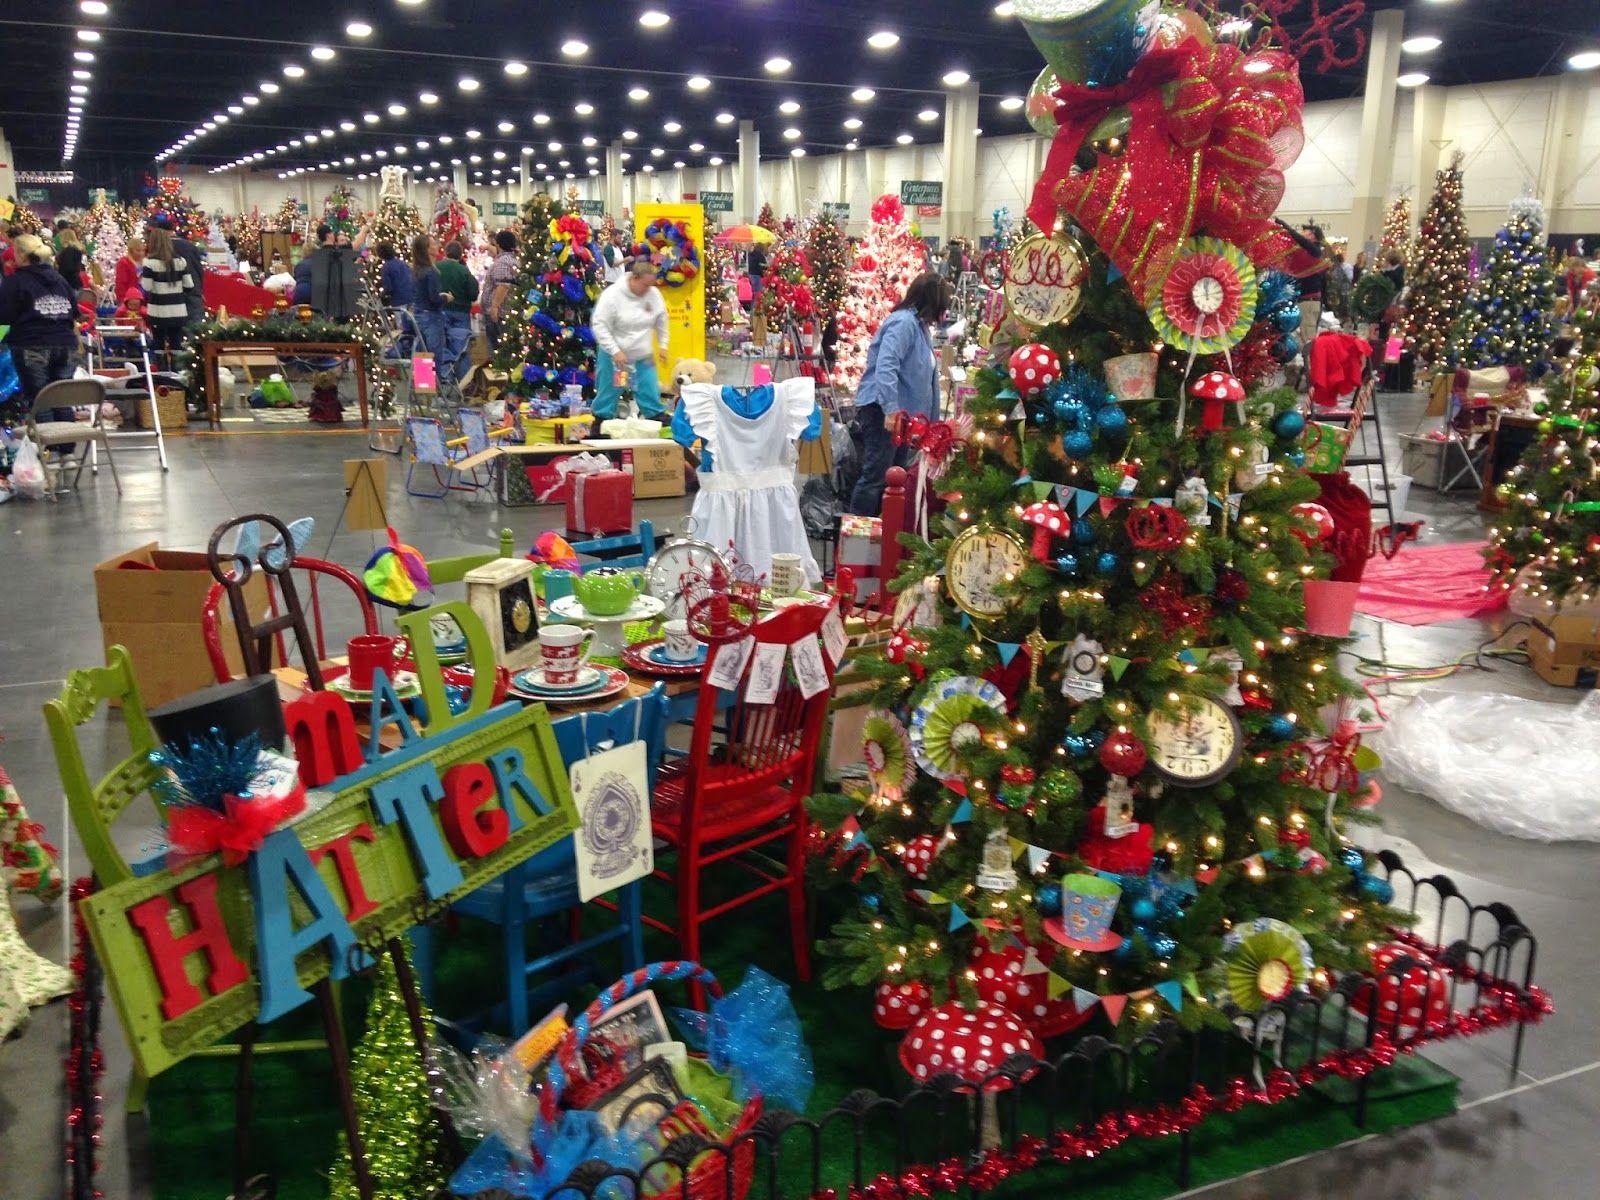 pollyanna reinvents mad hatters tea party christmas tree - Christmas Pollyanna